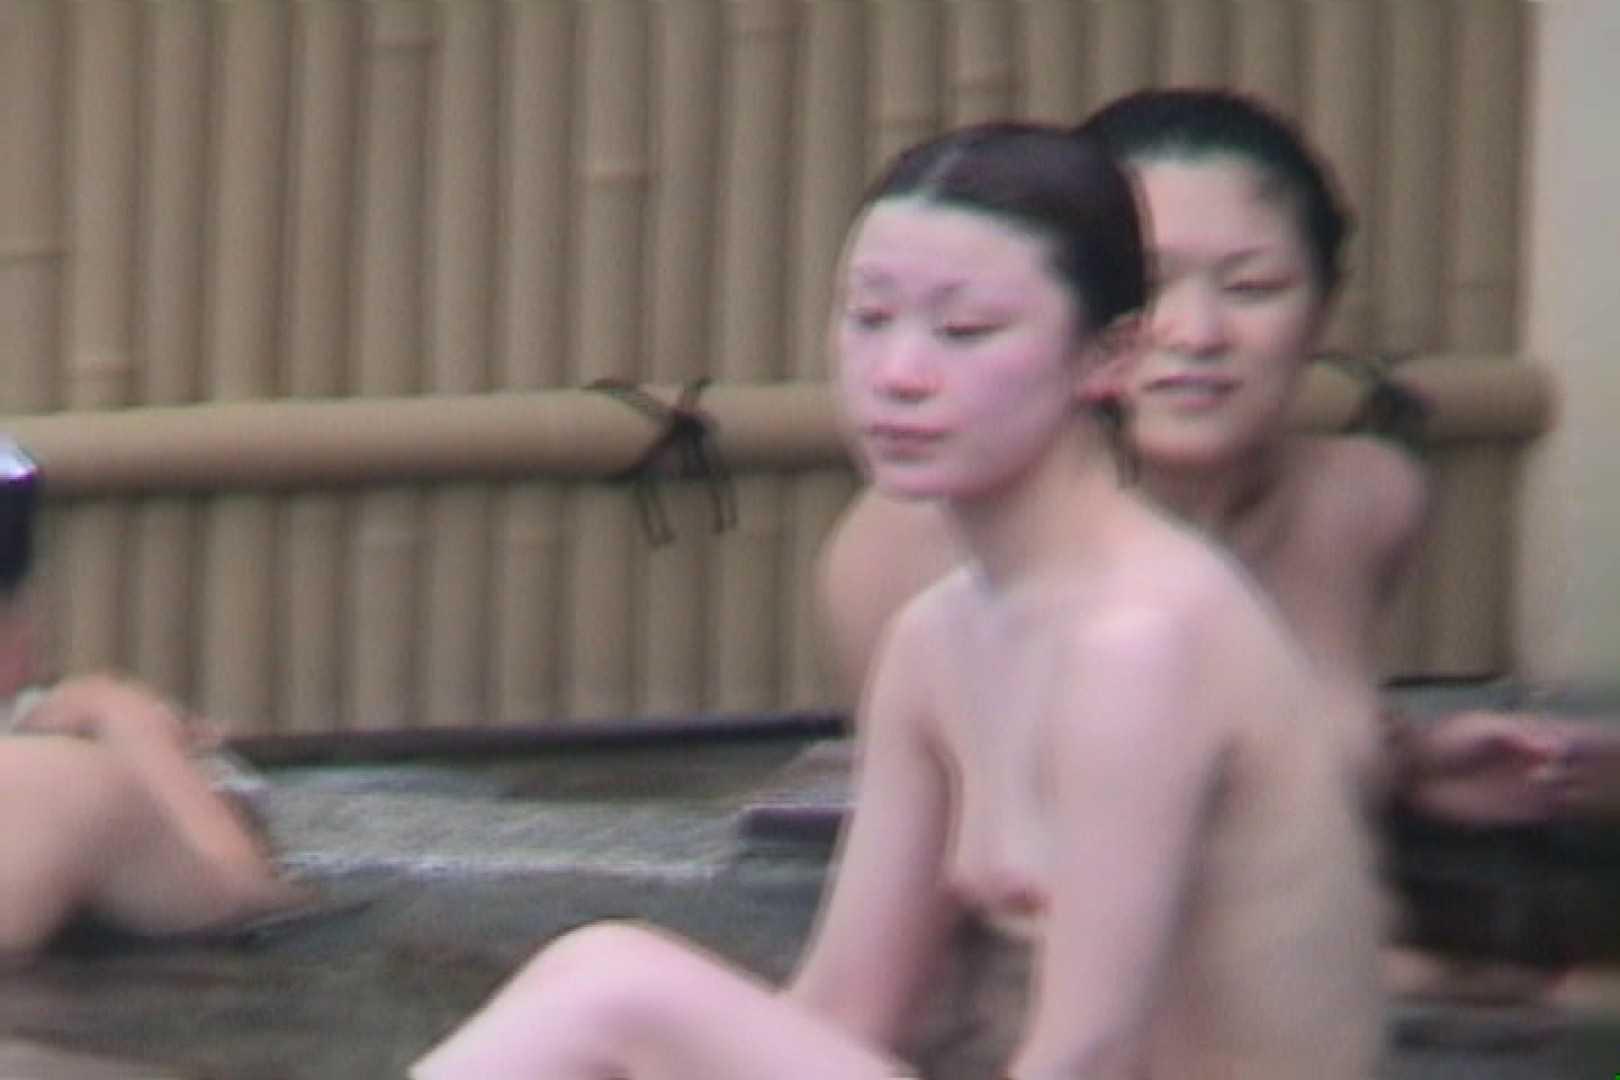 Aquaな露天風呂Vol.599 盗撮 われめAV動画紹介 71枚 2